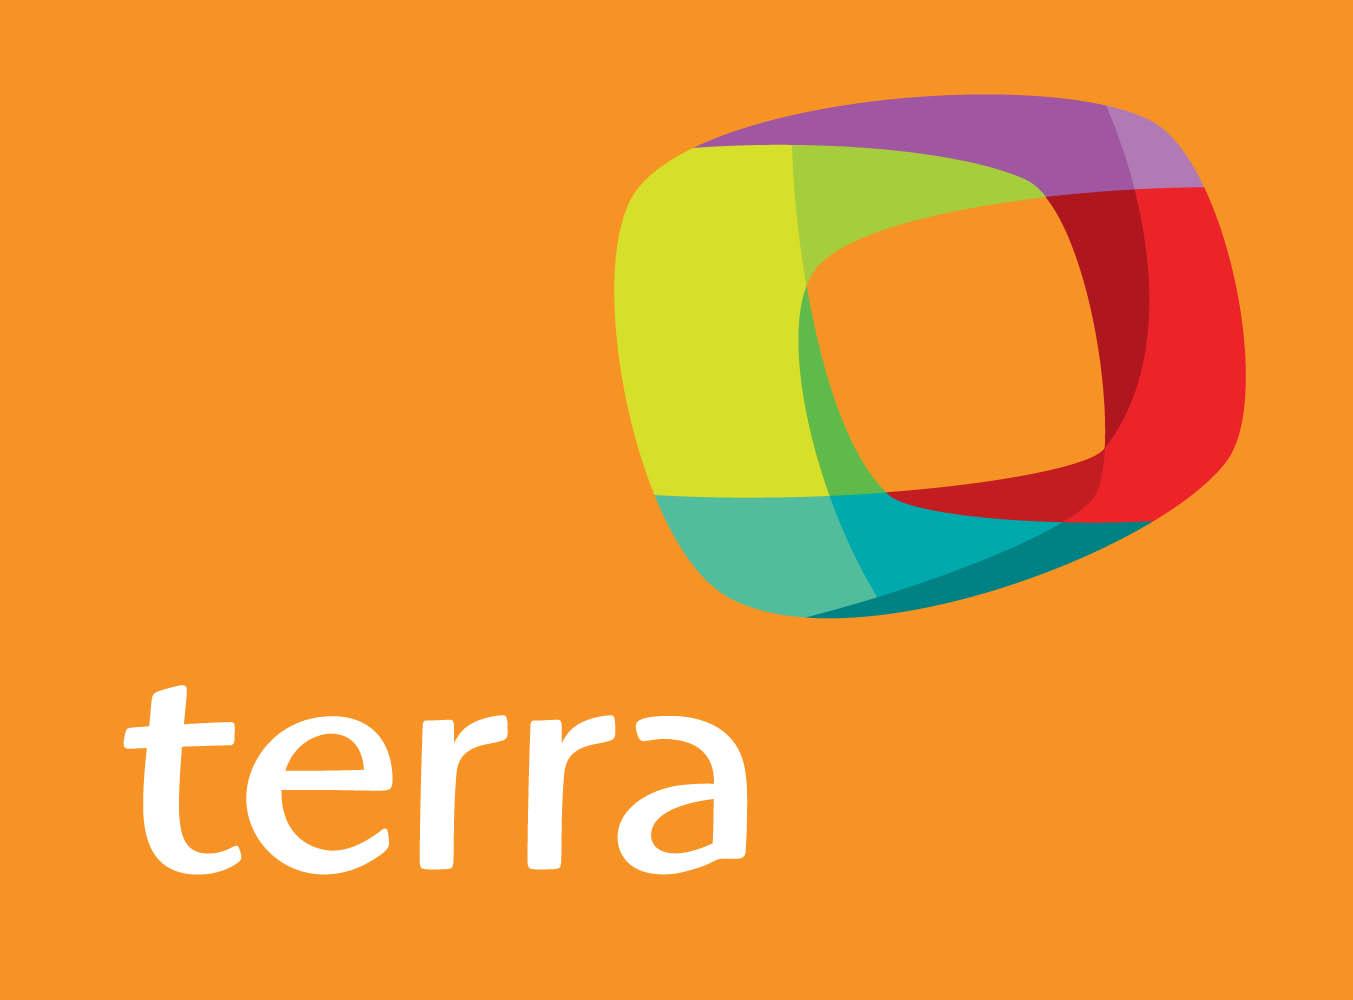 tataritaritat atendimento terra networks